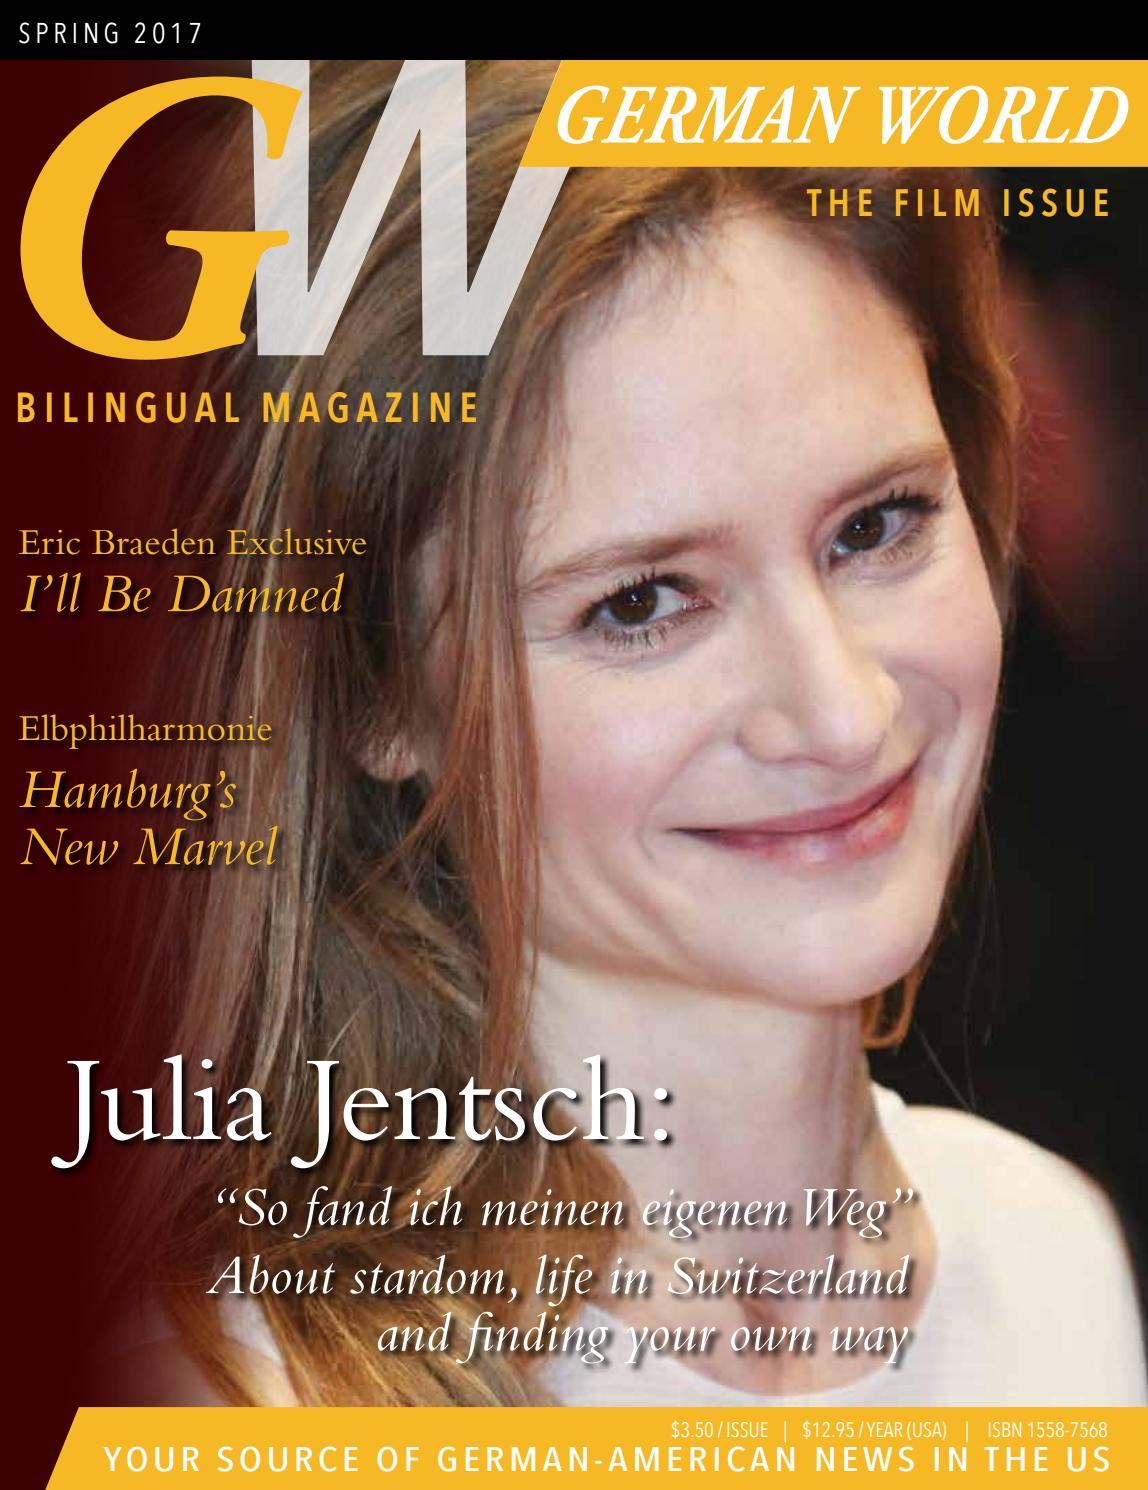 German World Magazine / Spring 2017 by German World Magazine - issuu